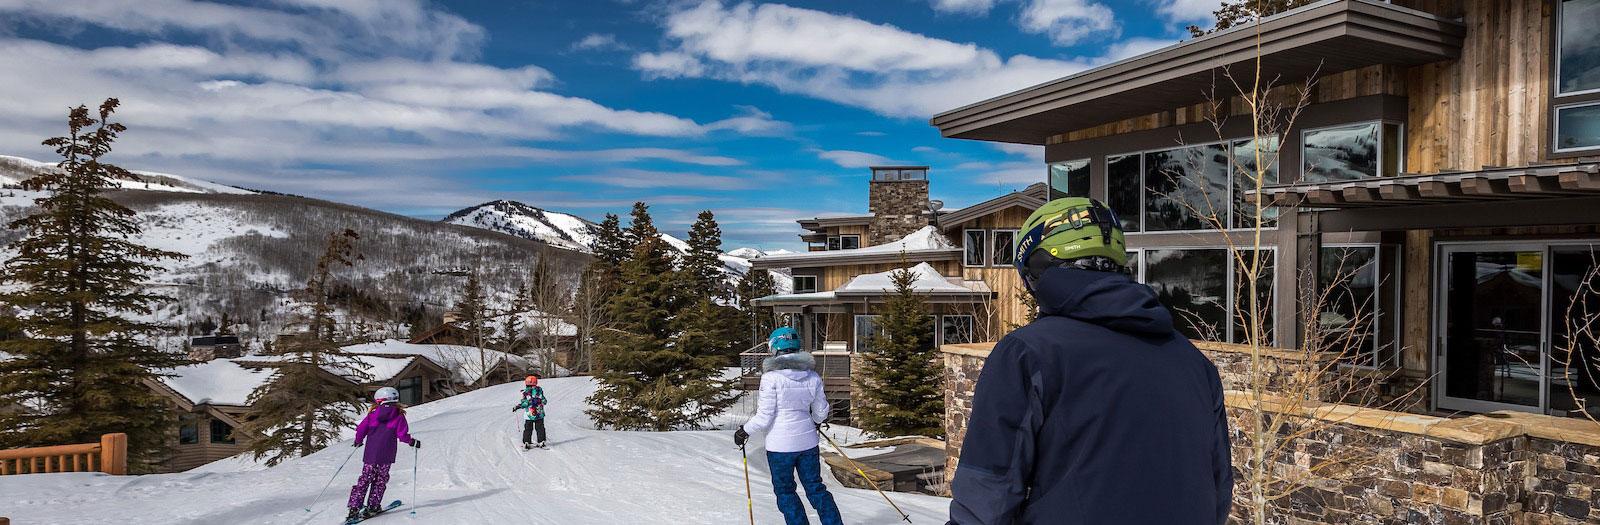 vacation rentals, ski vacation homes, private ski rentals